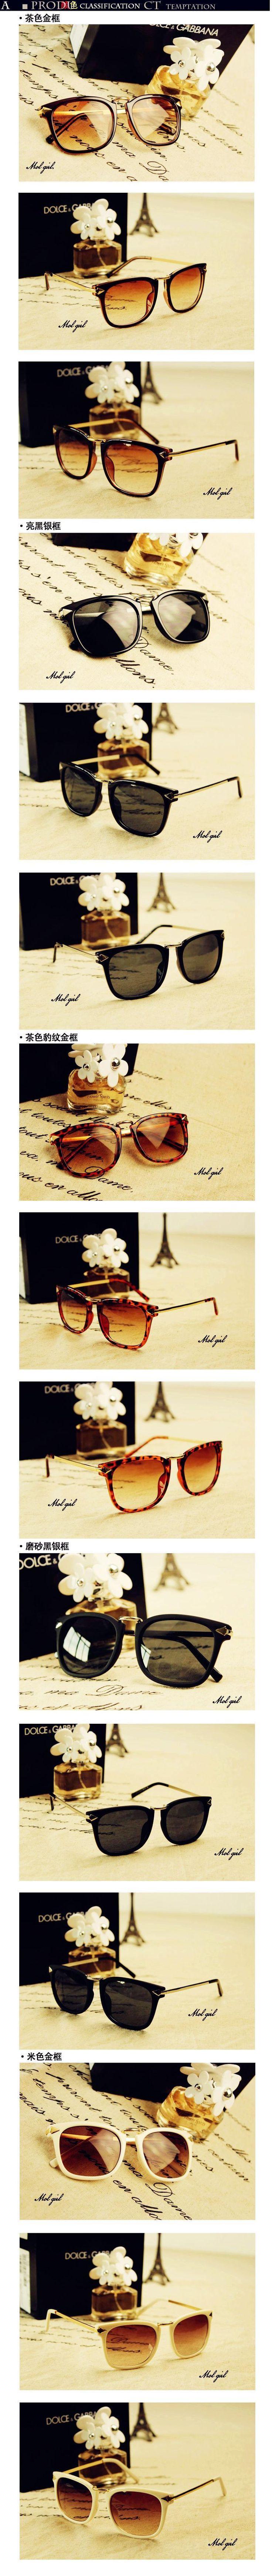 Klun fashion vintage ultralarge black box arrow metal mirror male women's sun glasses sunglasses